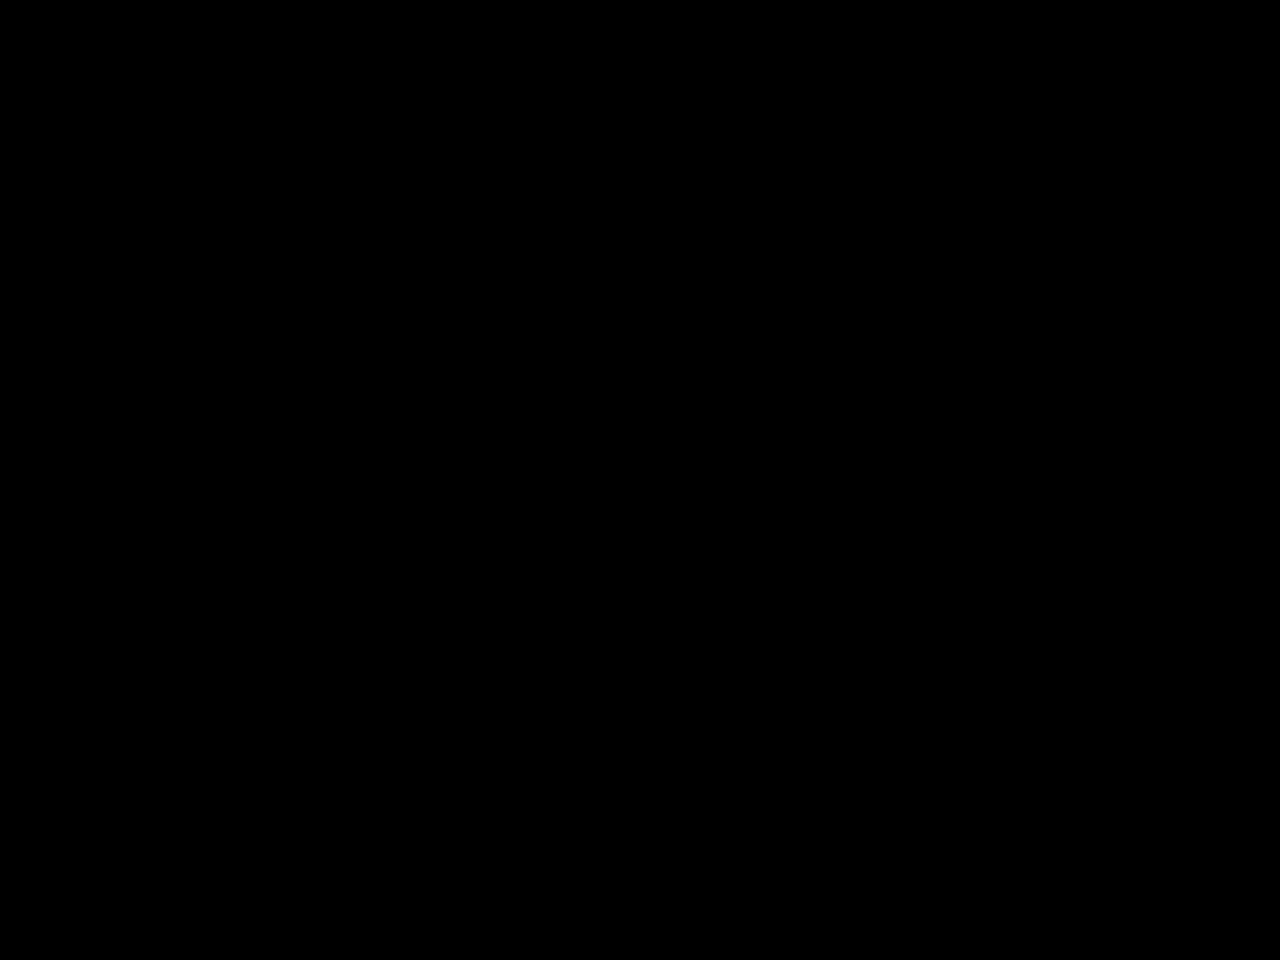 1280x960 Black Solid Color Background